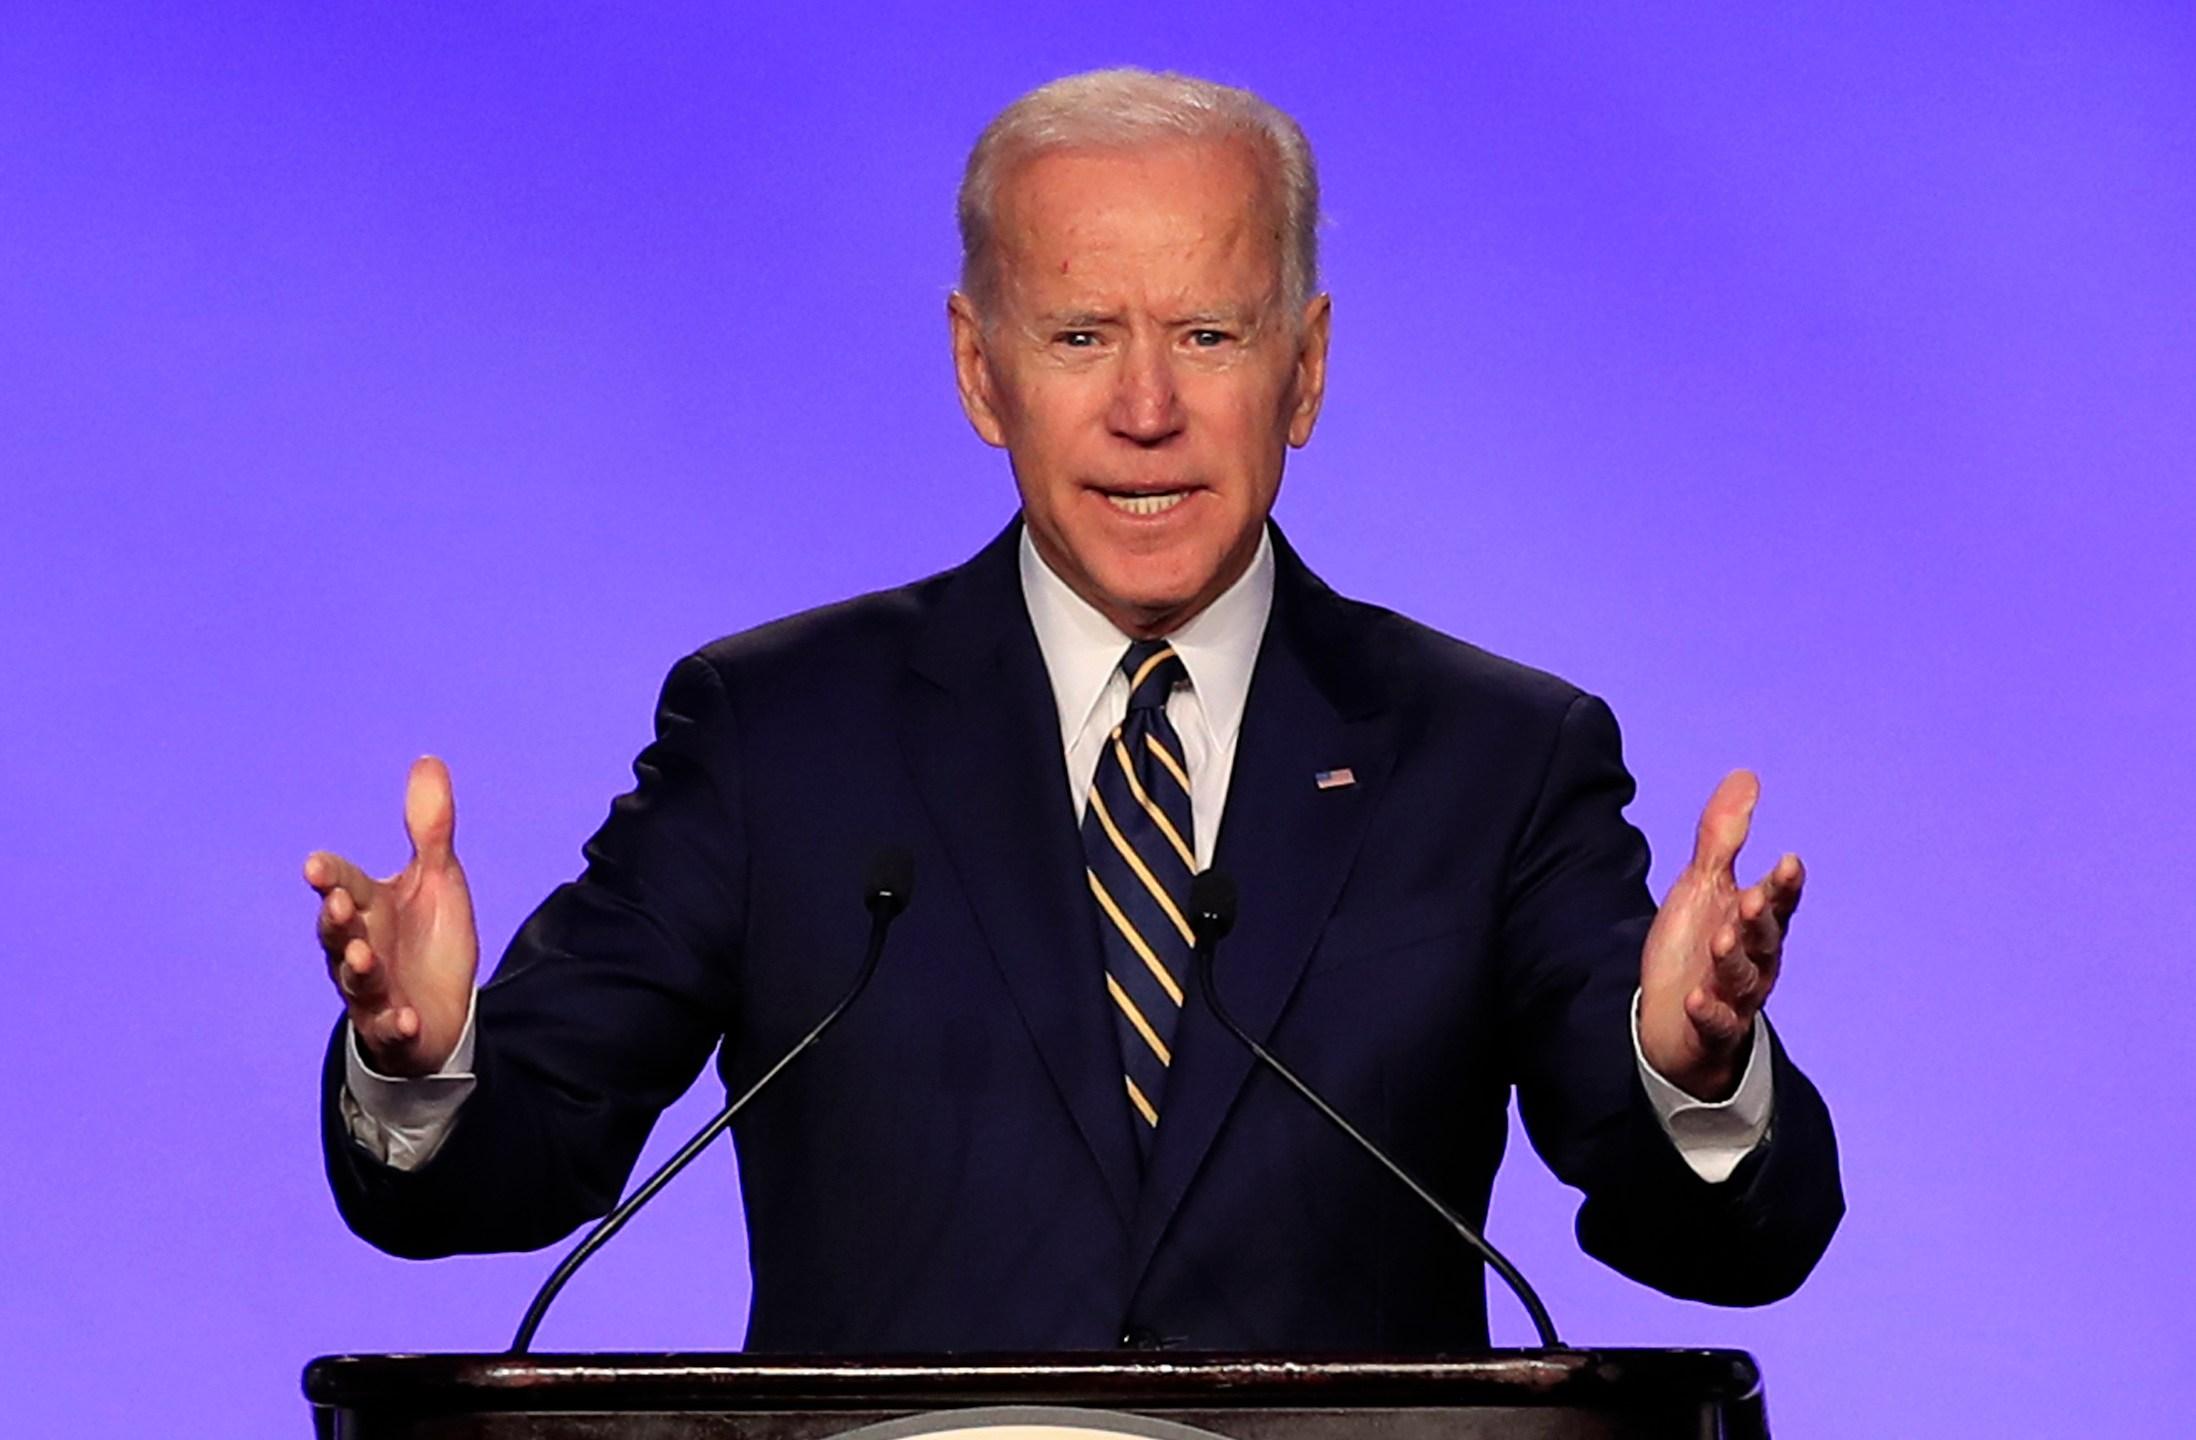 Election_2020_Joe_Biden_54825-159532.jpg39479392